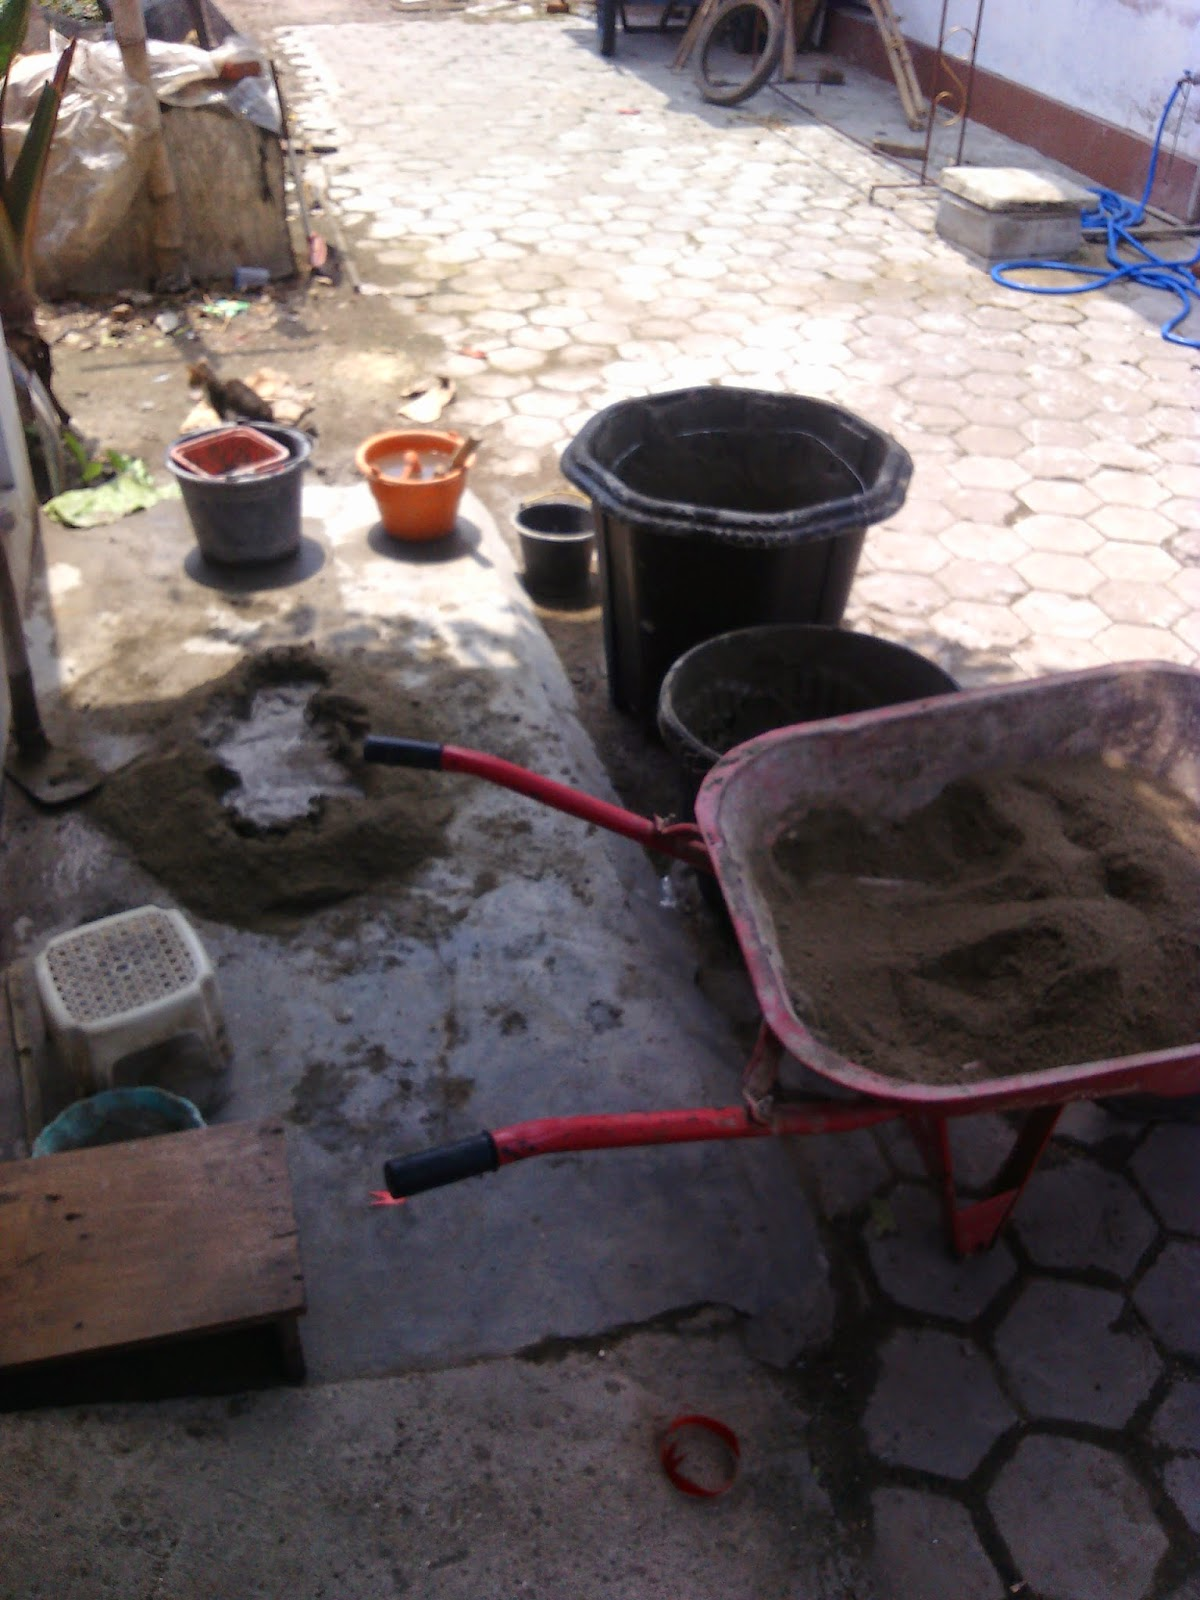 peduli lingkungan  cara membuat pot semen paling evektif f9426a87bf